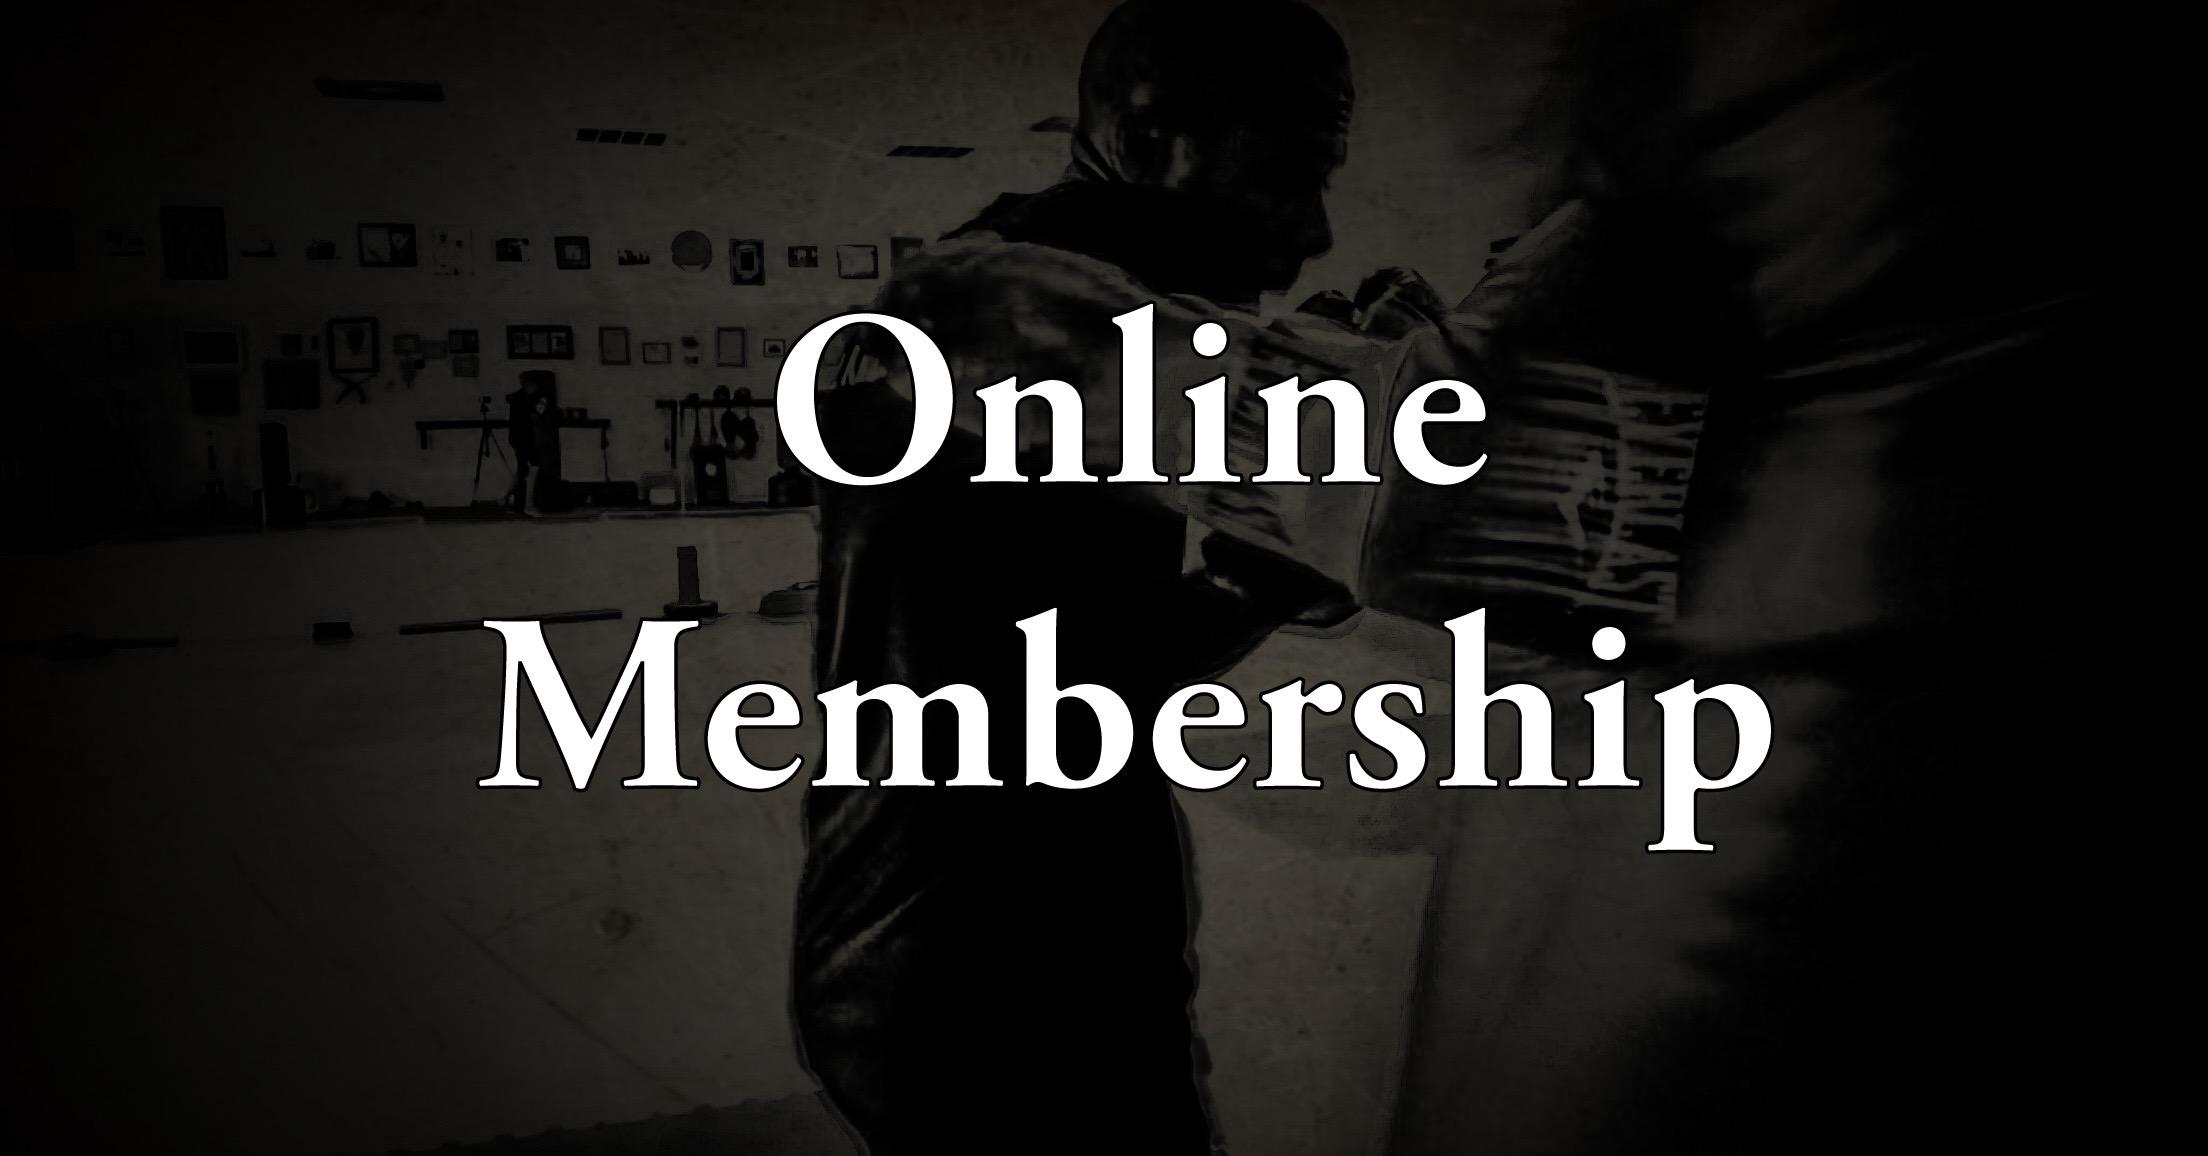 Online Membership